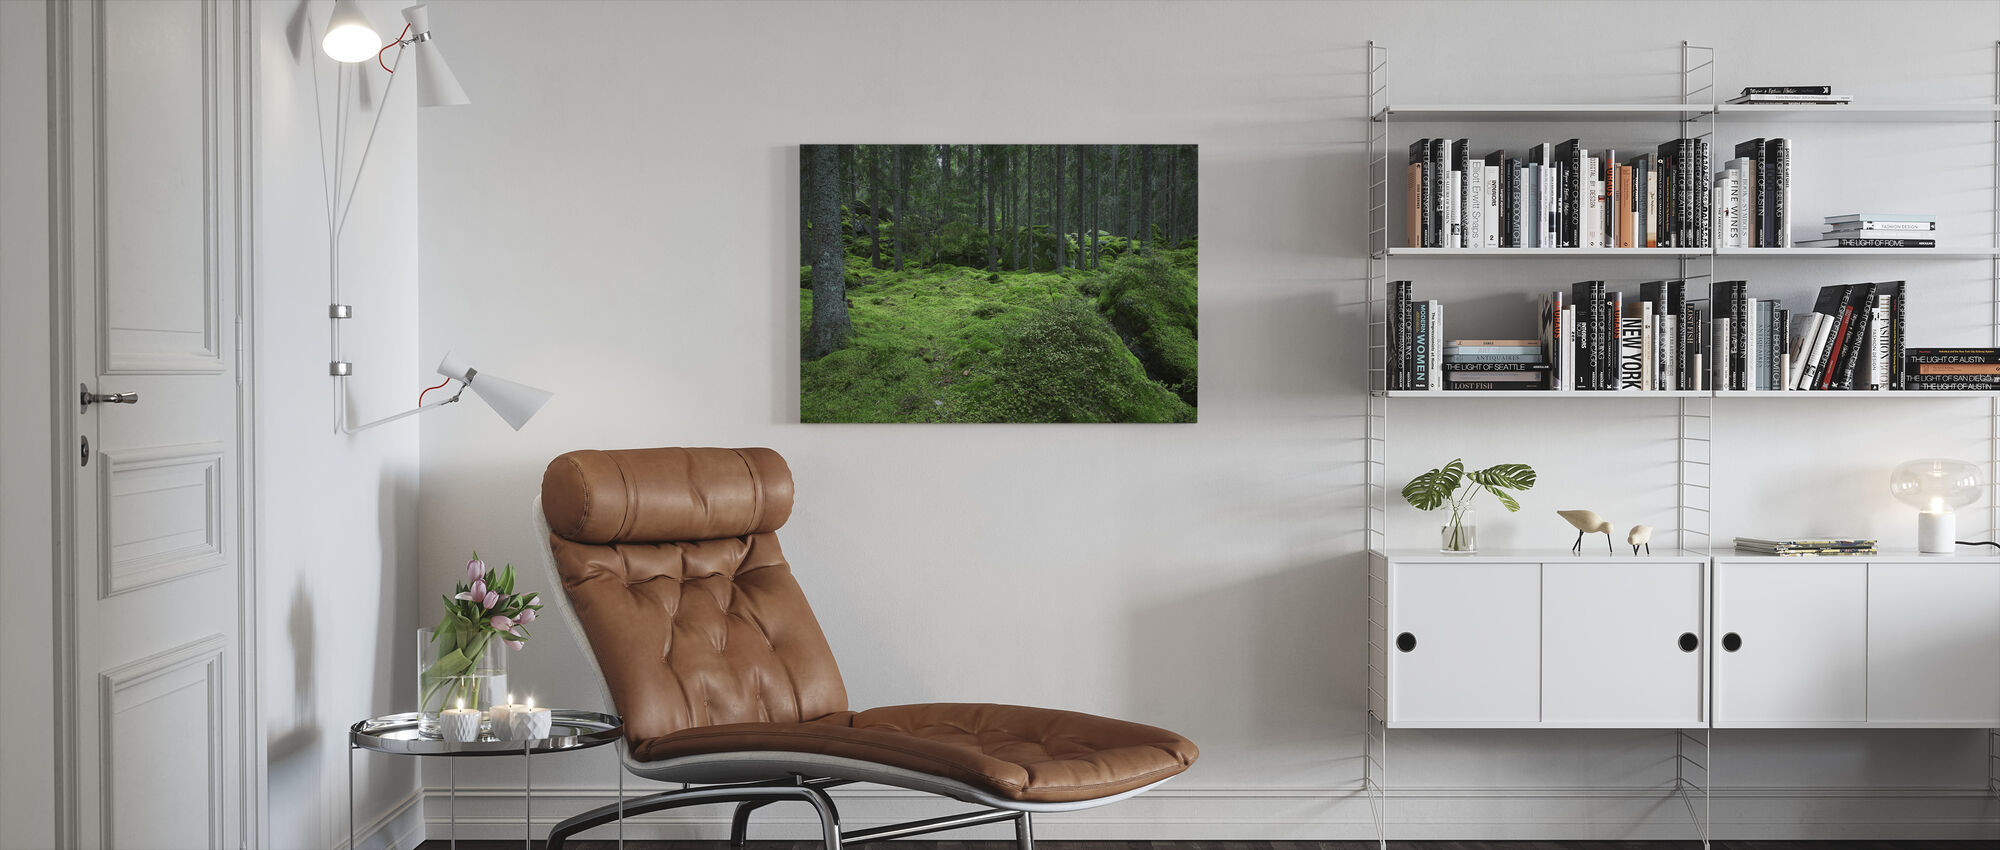 Troll skog 2 - Canvastavla - Vardagsrum